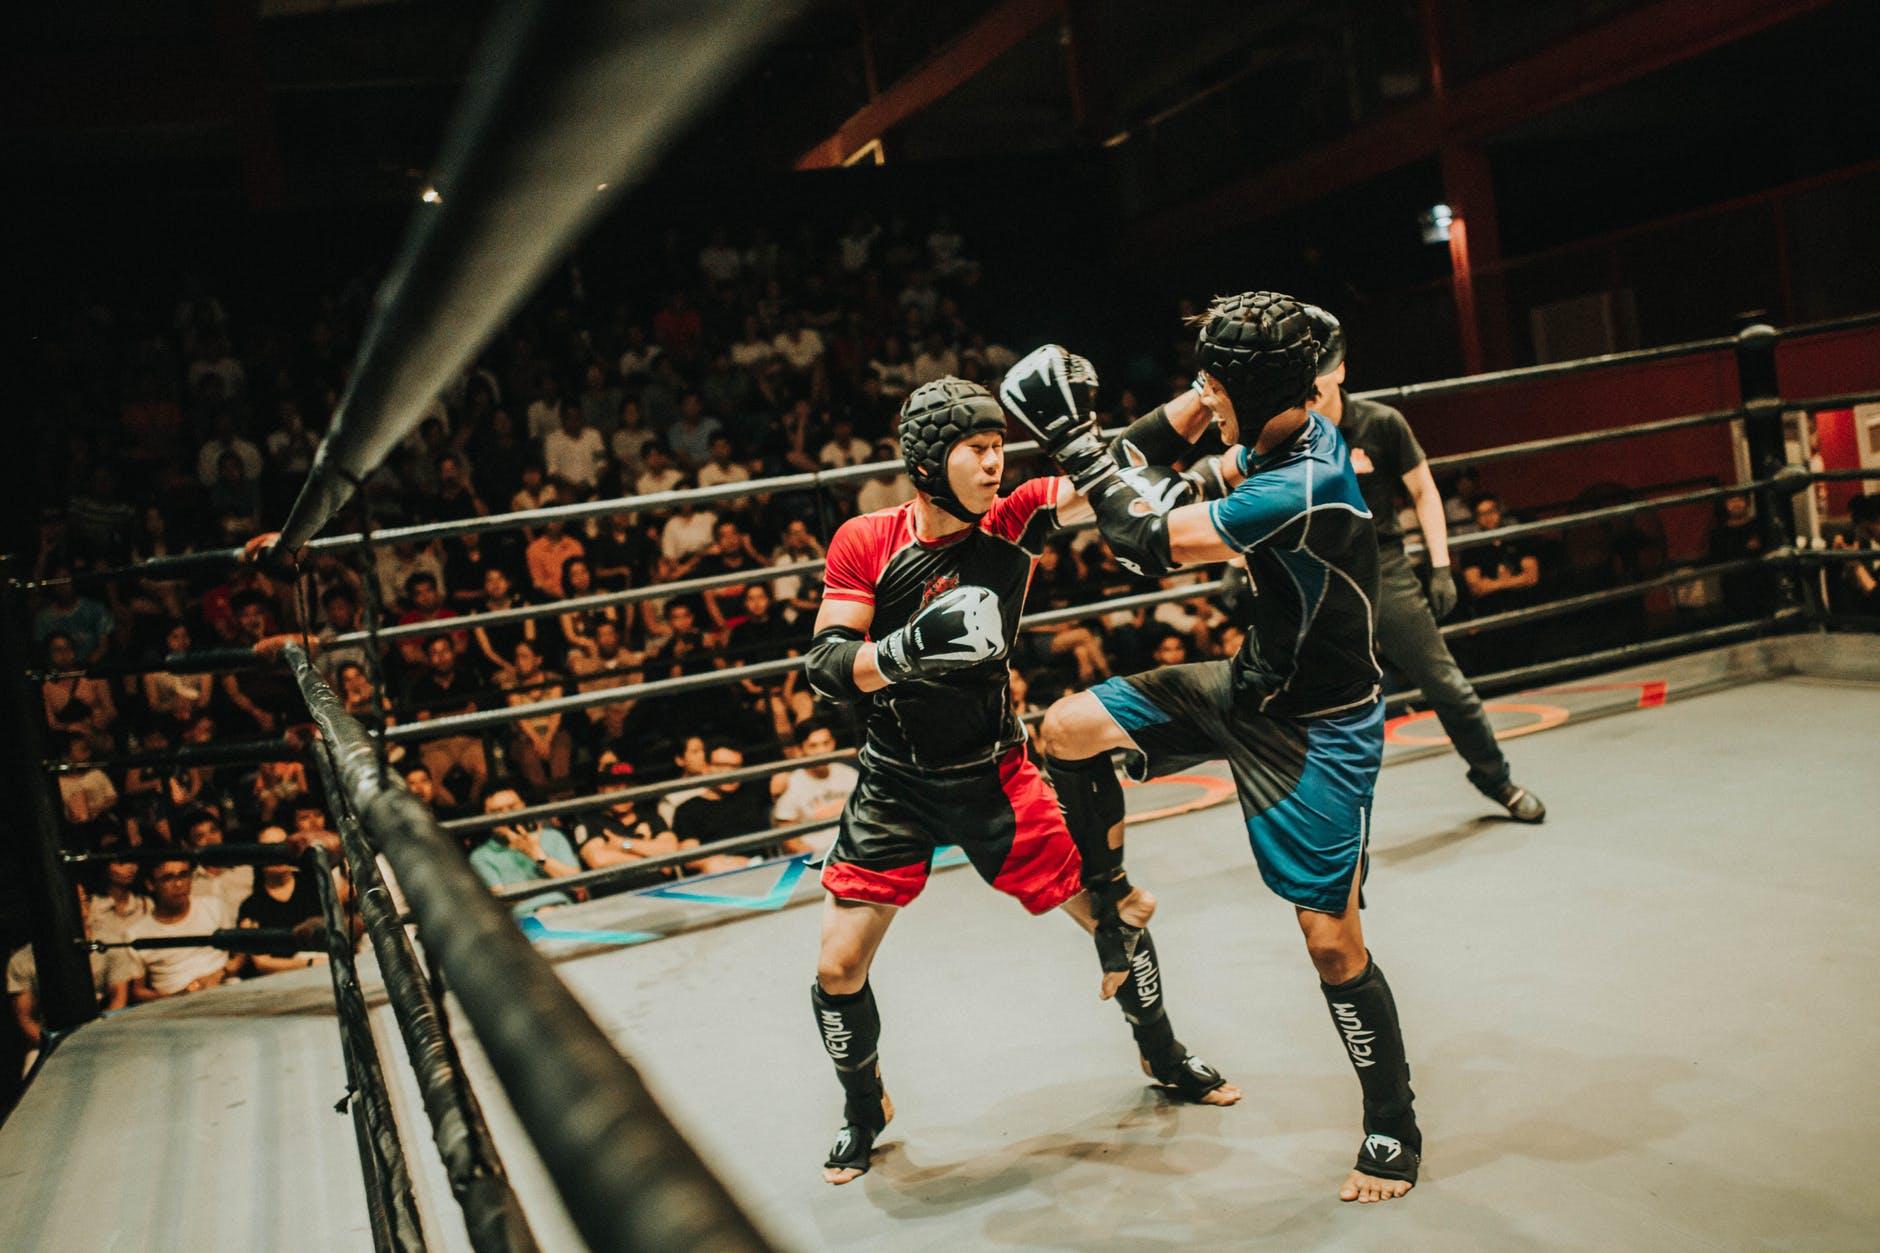 action adult athletes battle